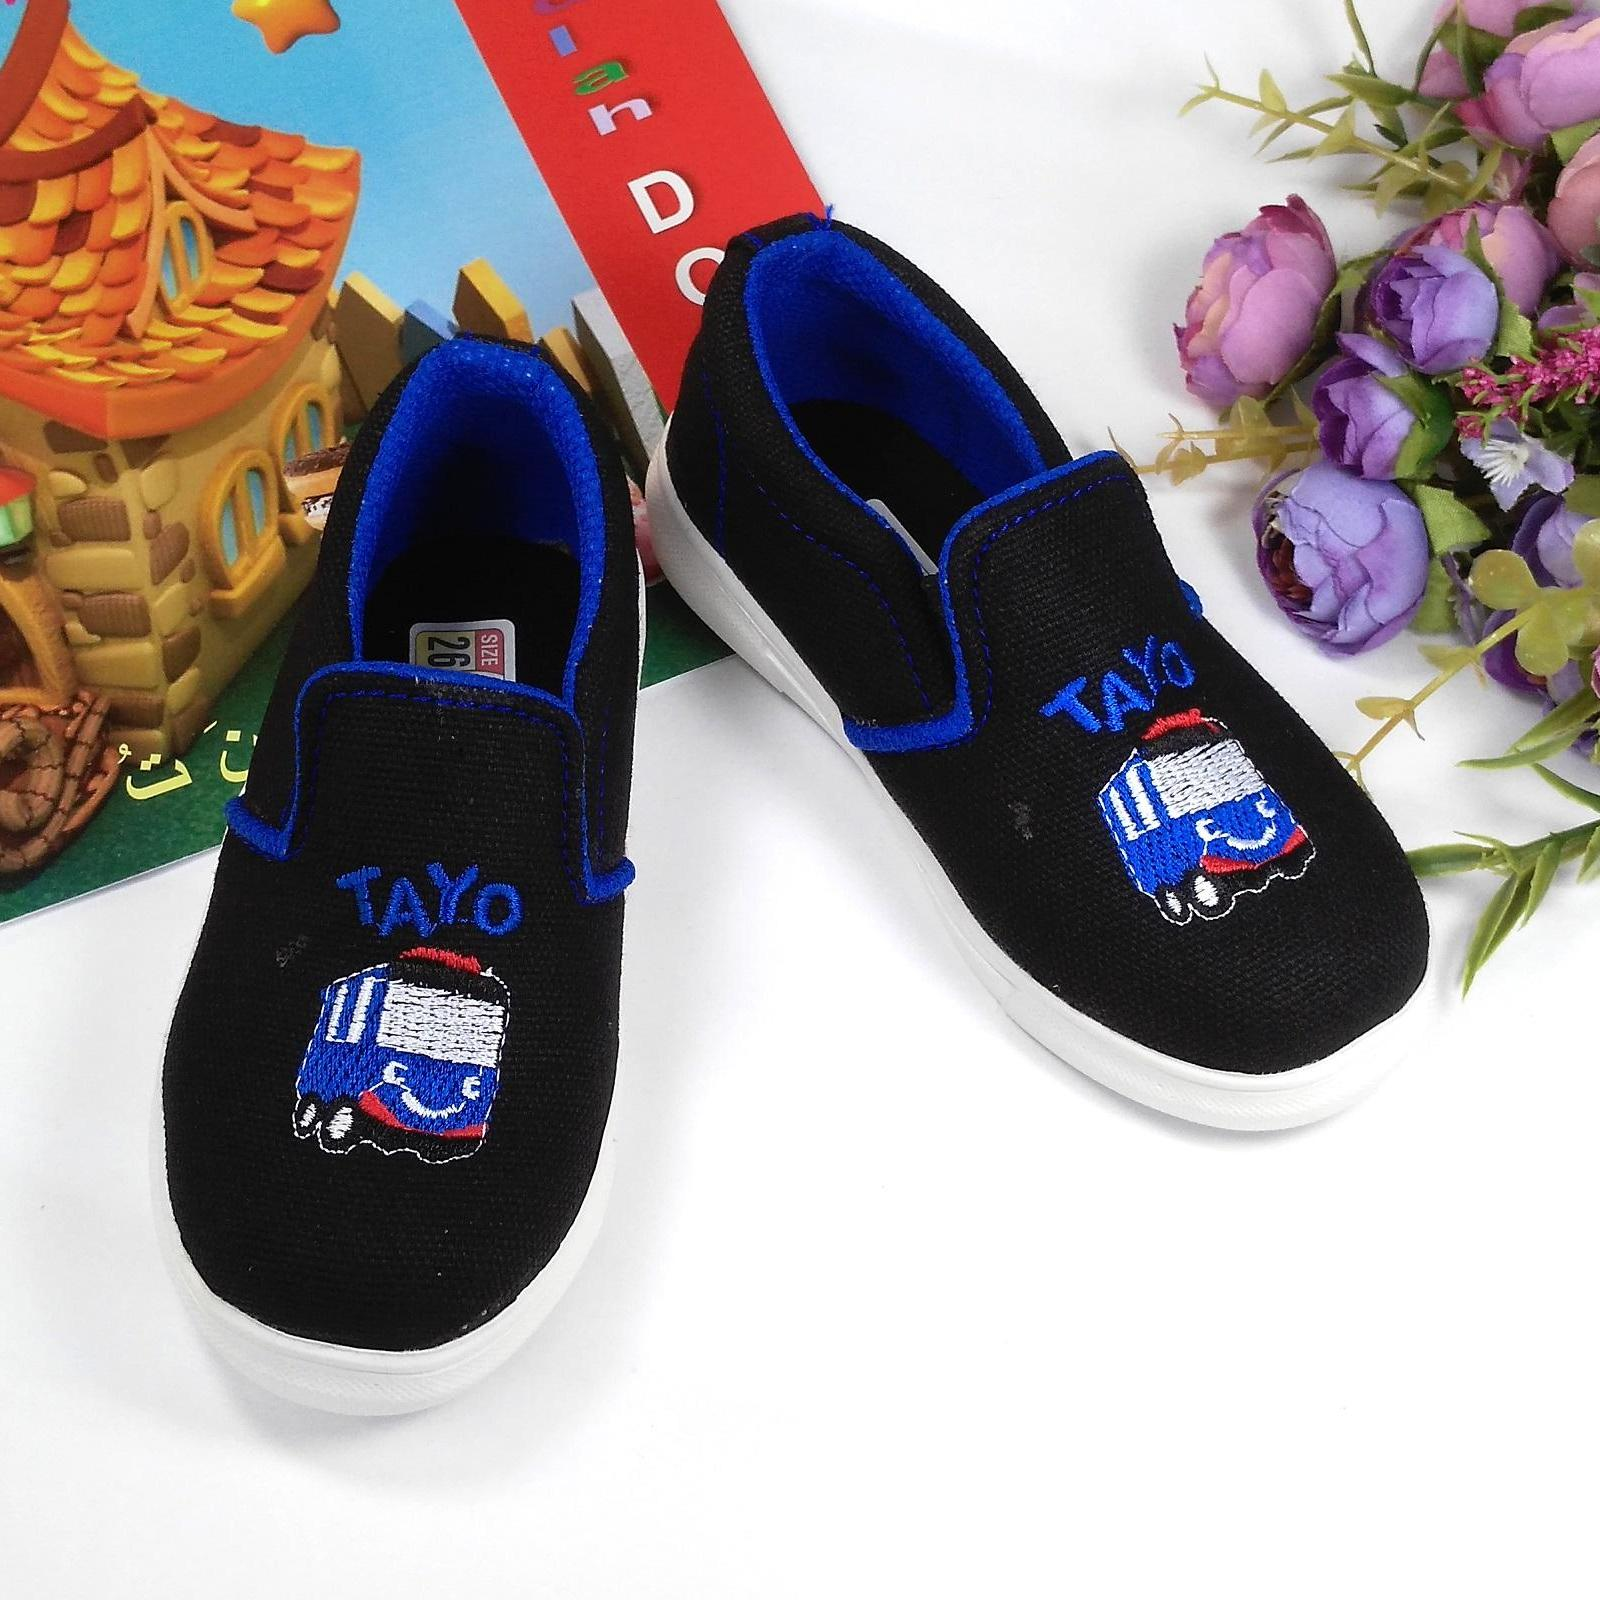 Sepatu Slip On Anak Laki Katalog Tayo Lelaki Hqo Cowok Casual